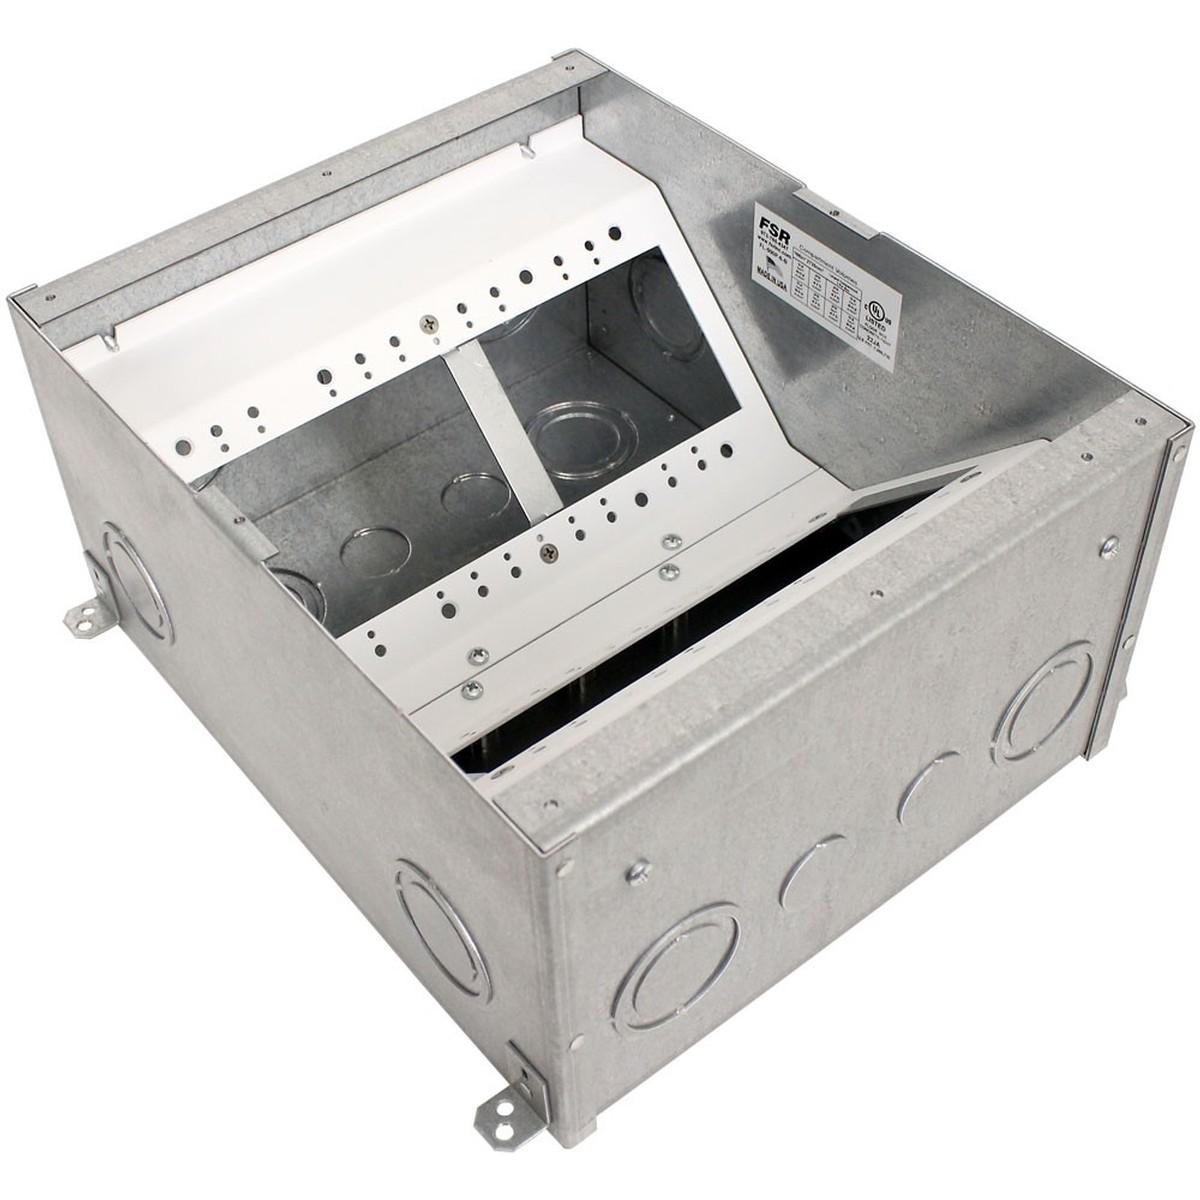 Fsr Fl 500p 6 B Ul Listed Floor Pour Box 6 Quot Deep